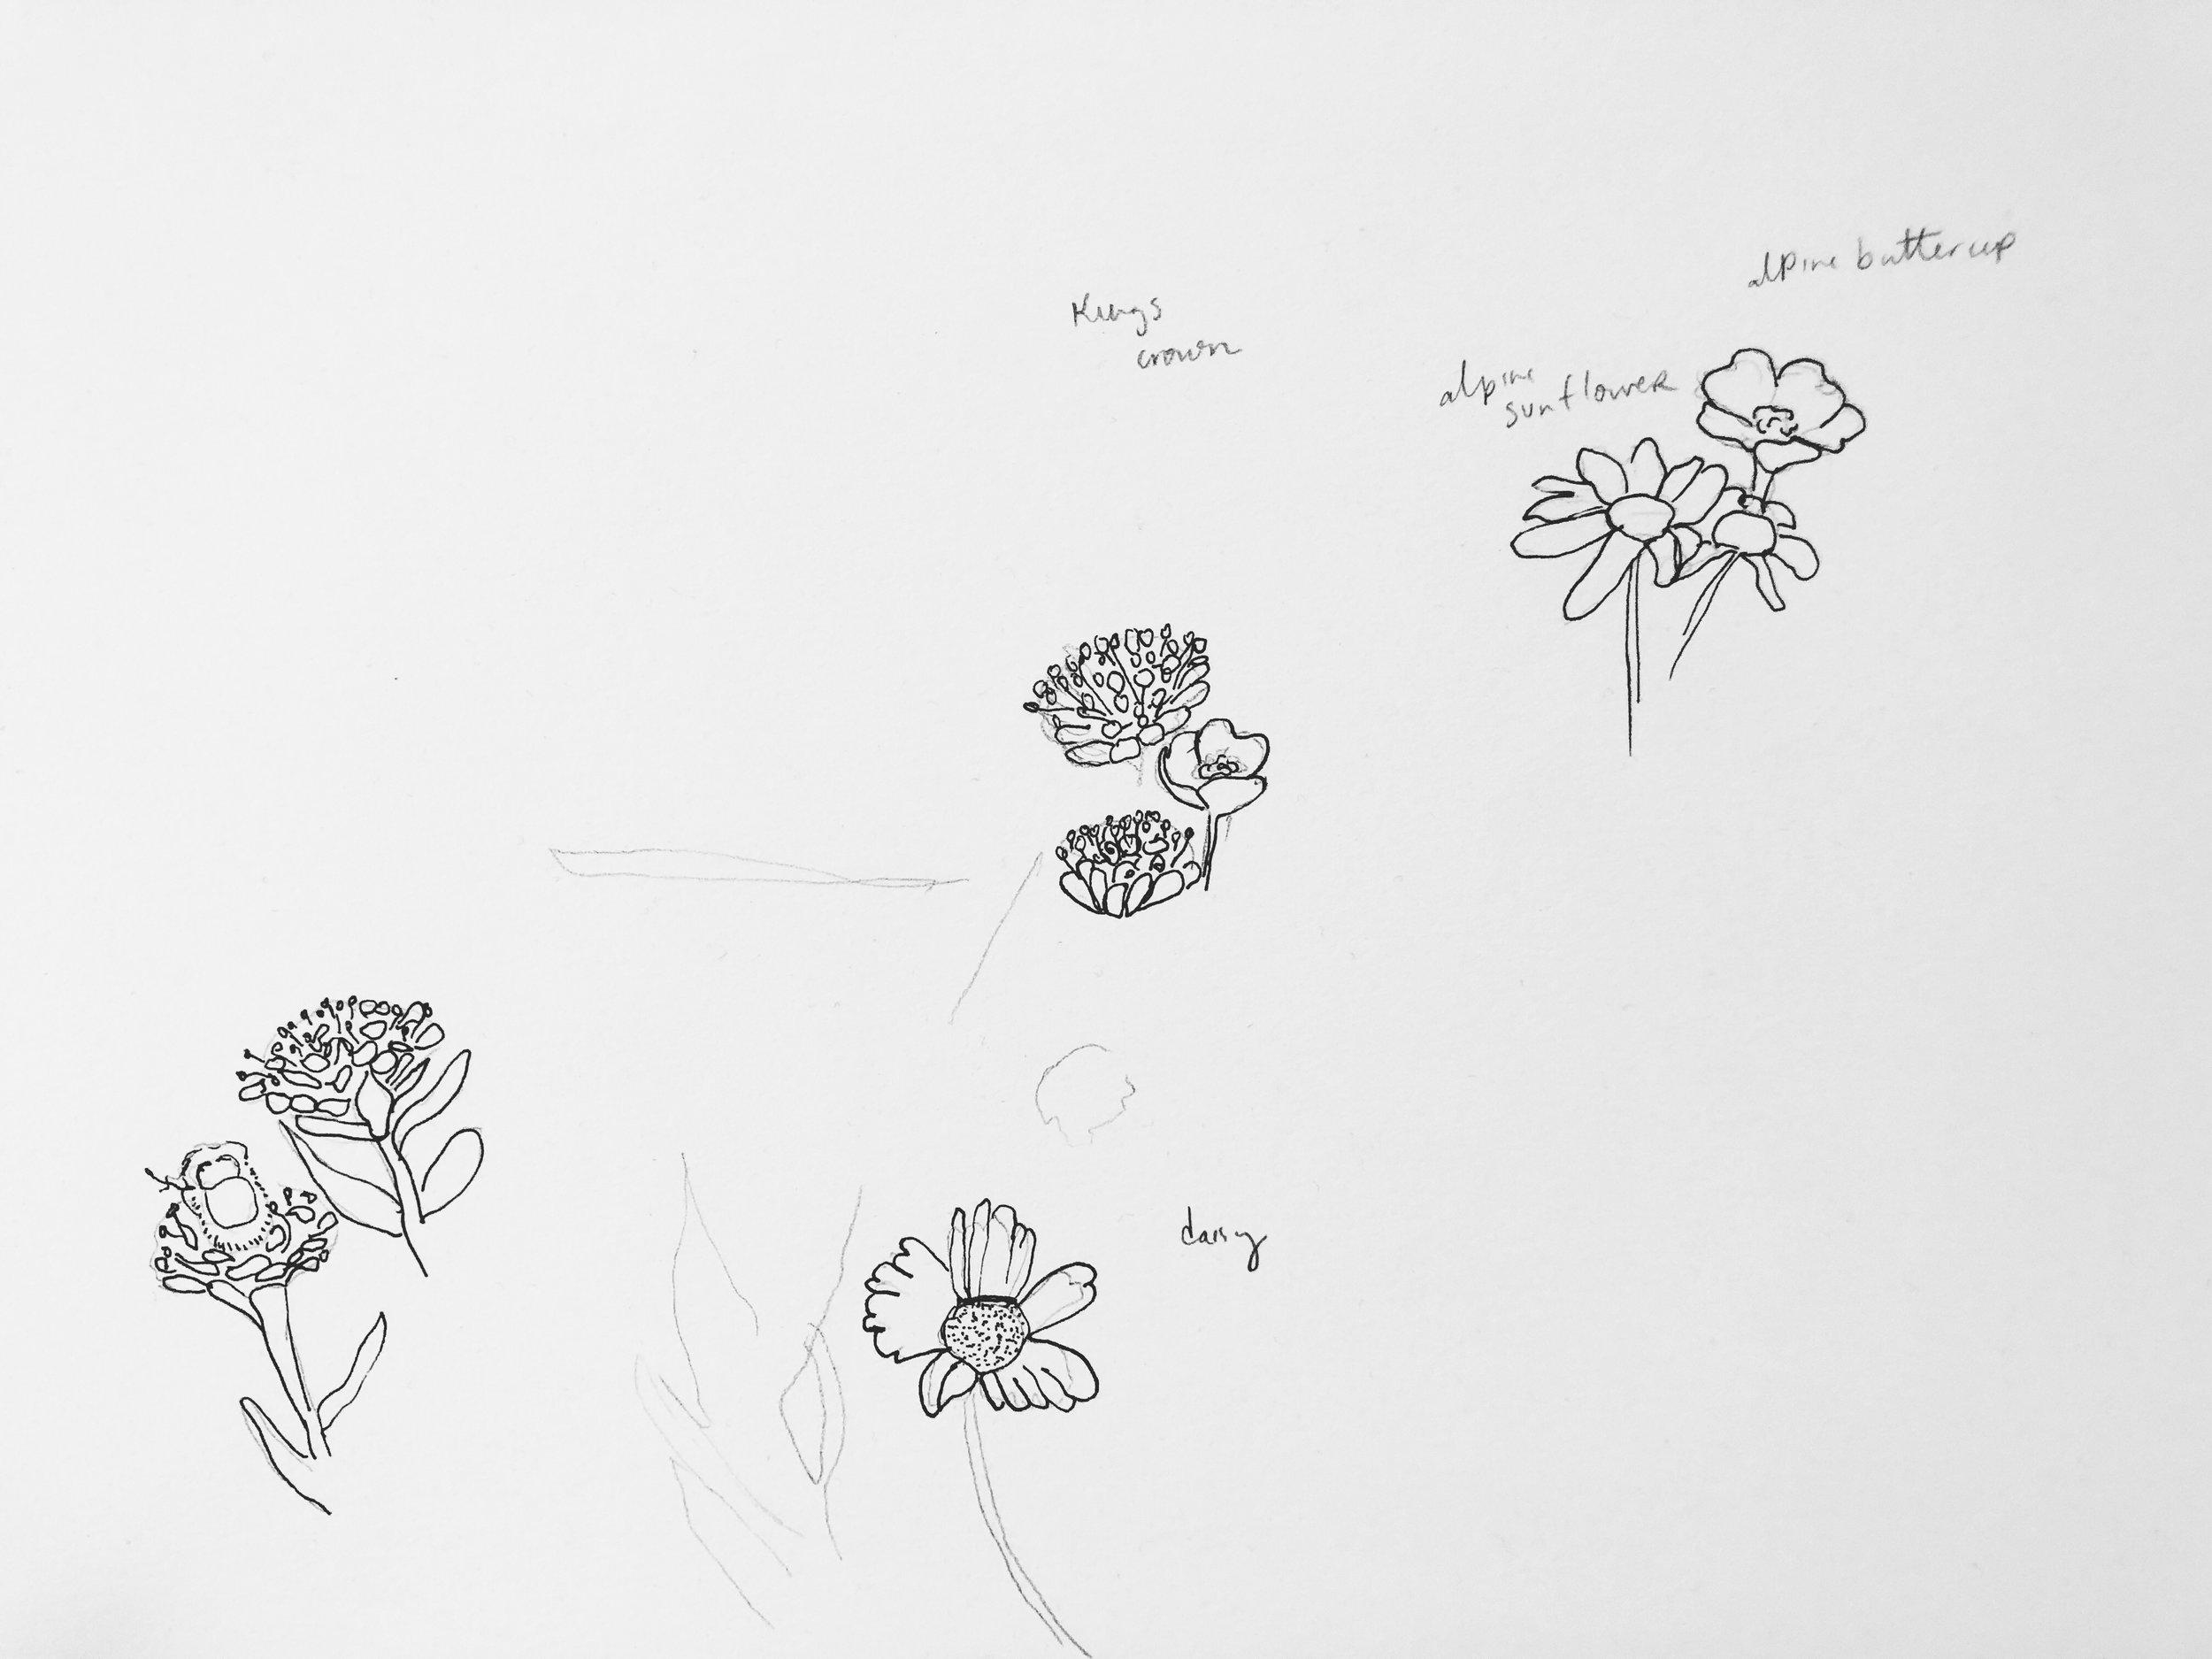 colorado wildflowers rebecca mir grady